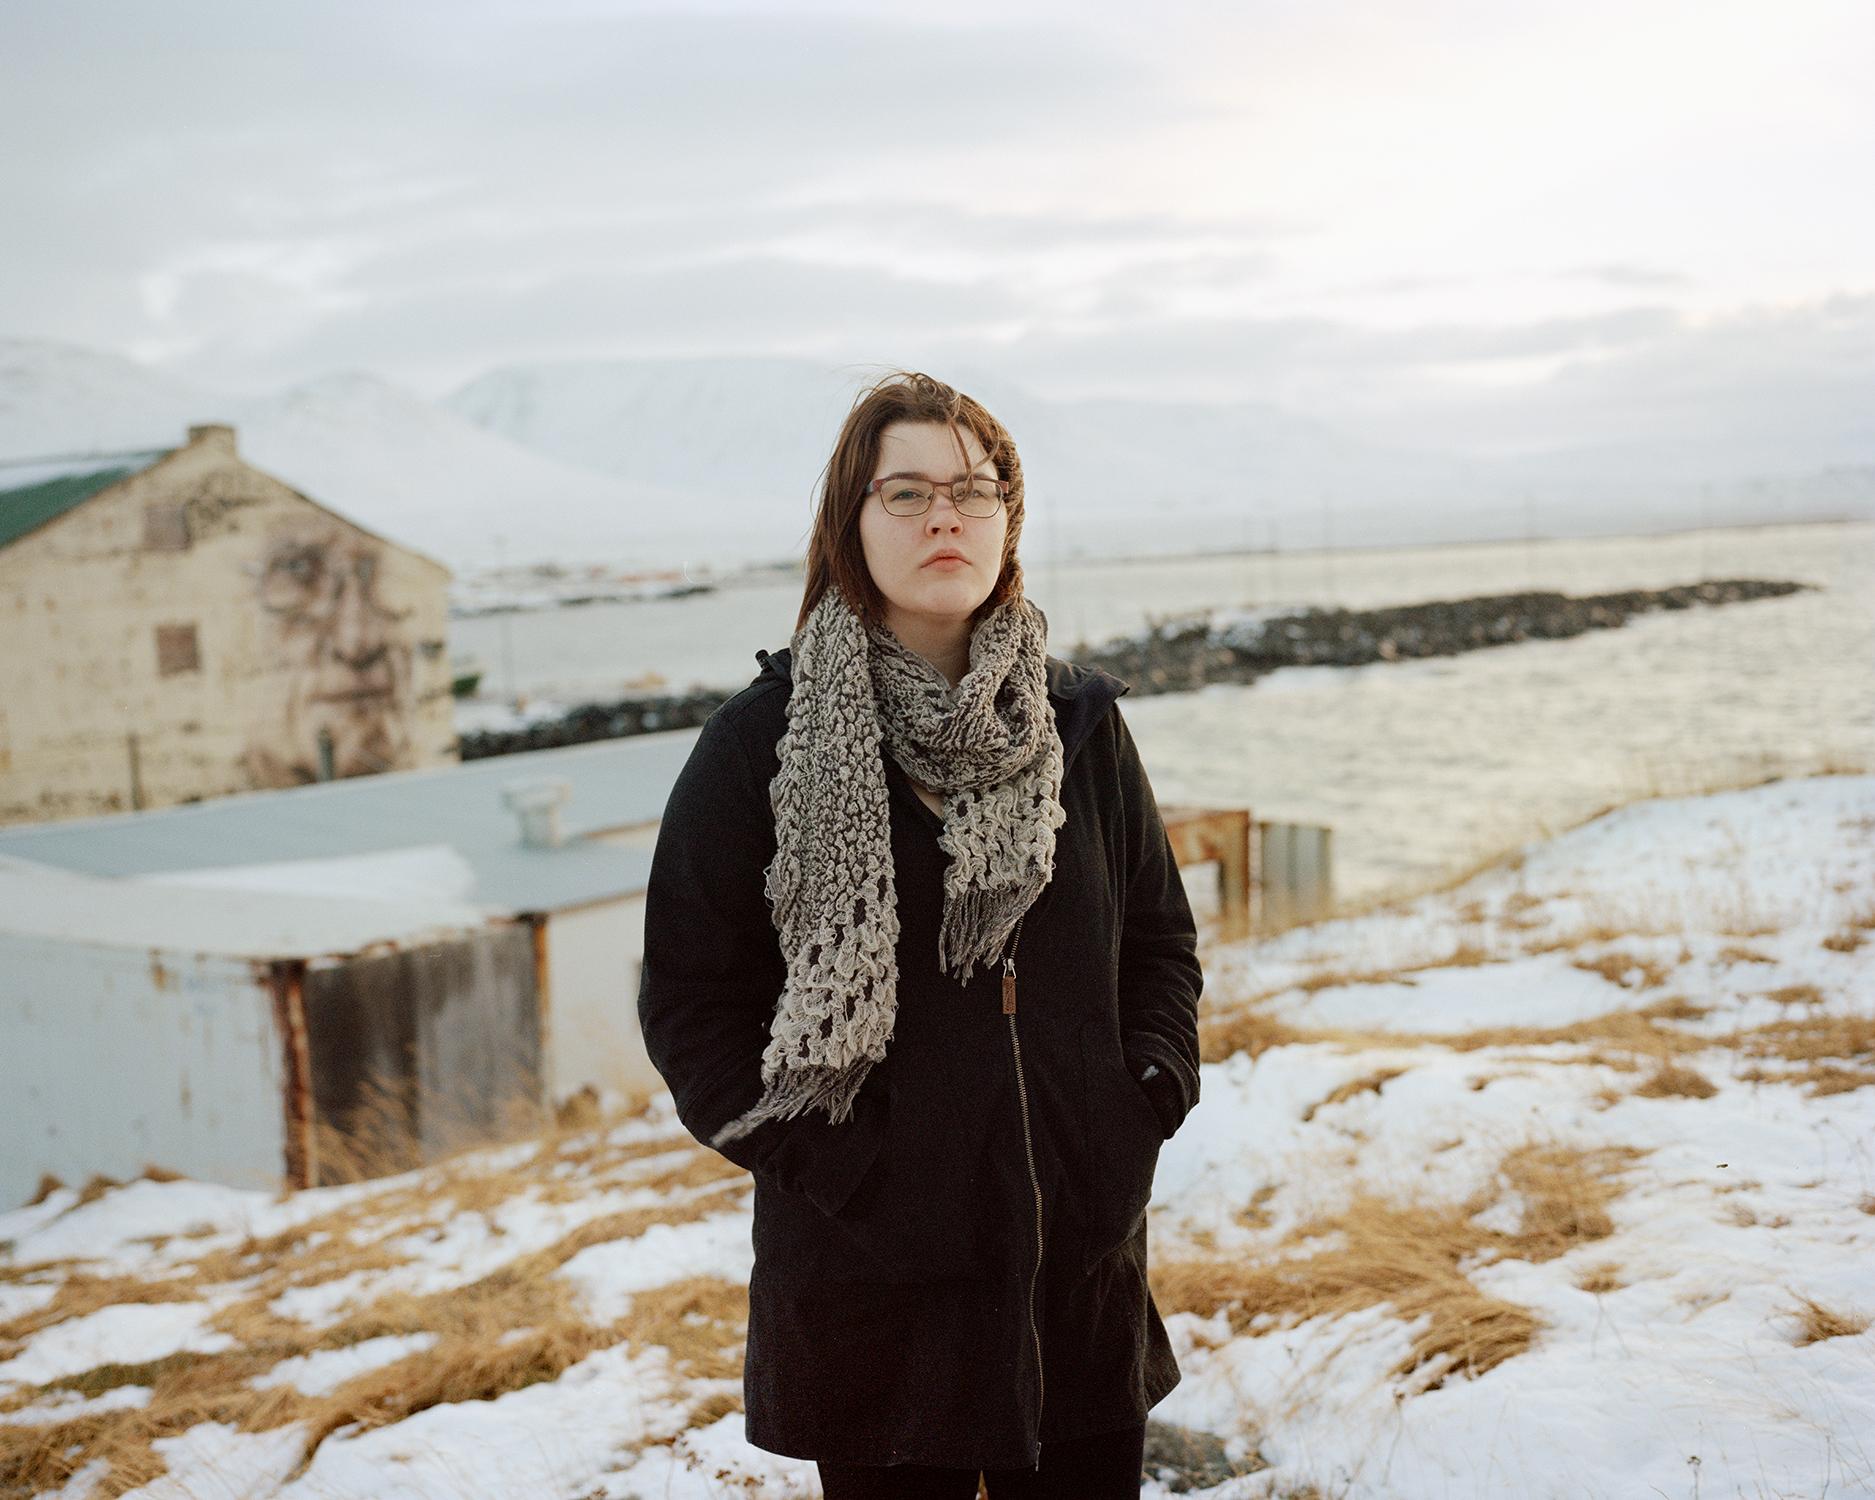 Iceland_001 003.jpg